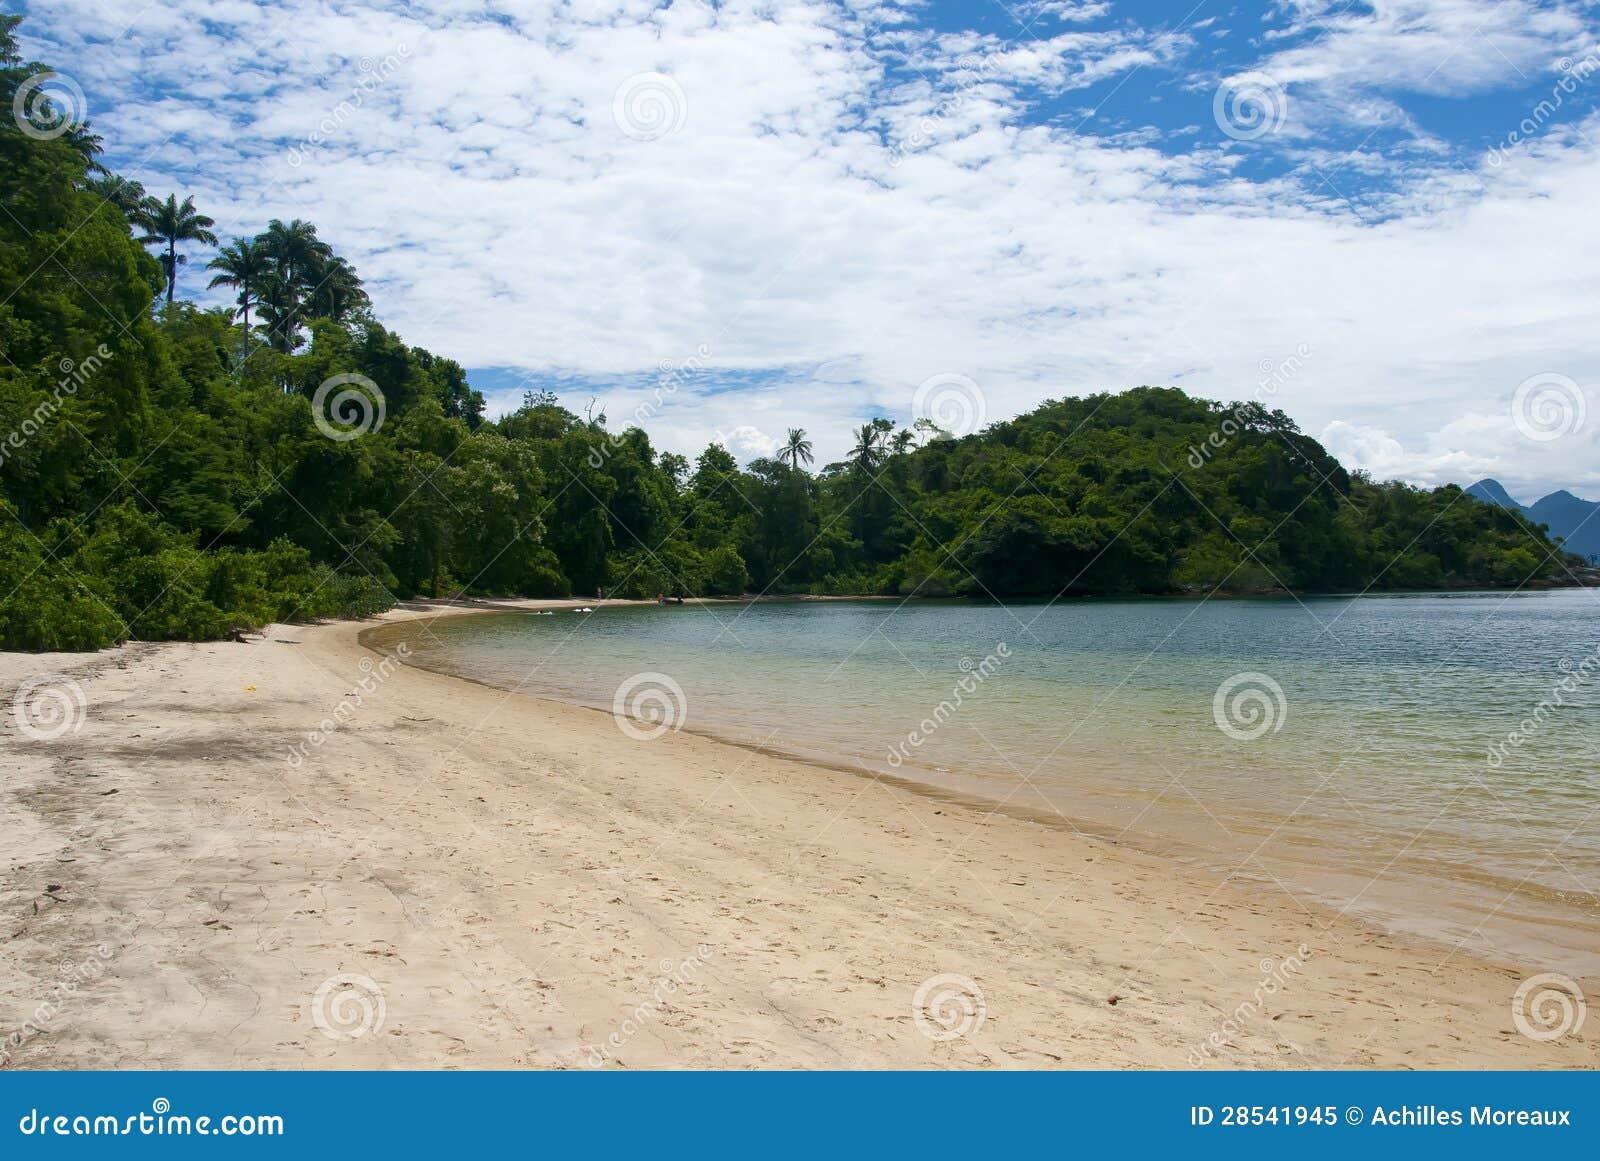 Playa de Tangua